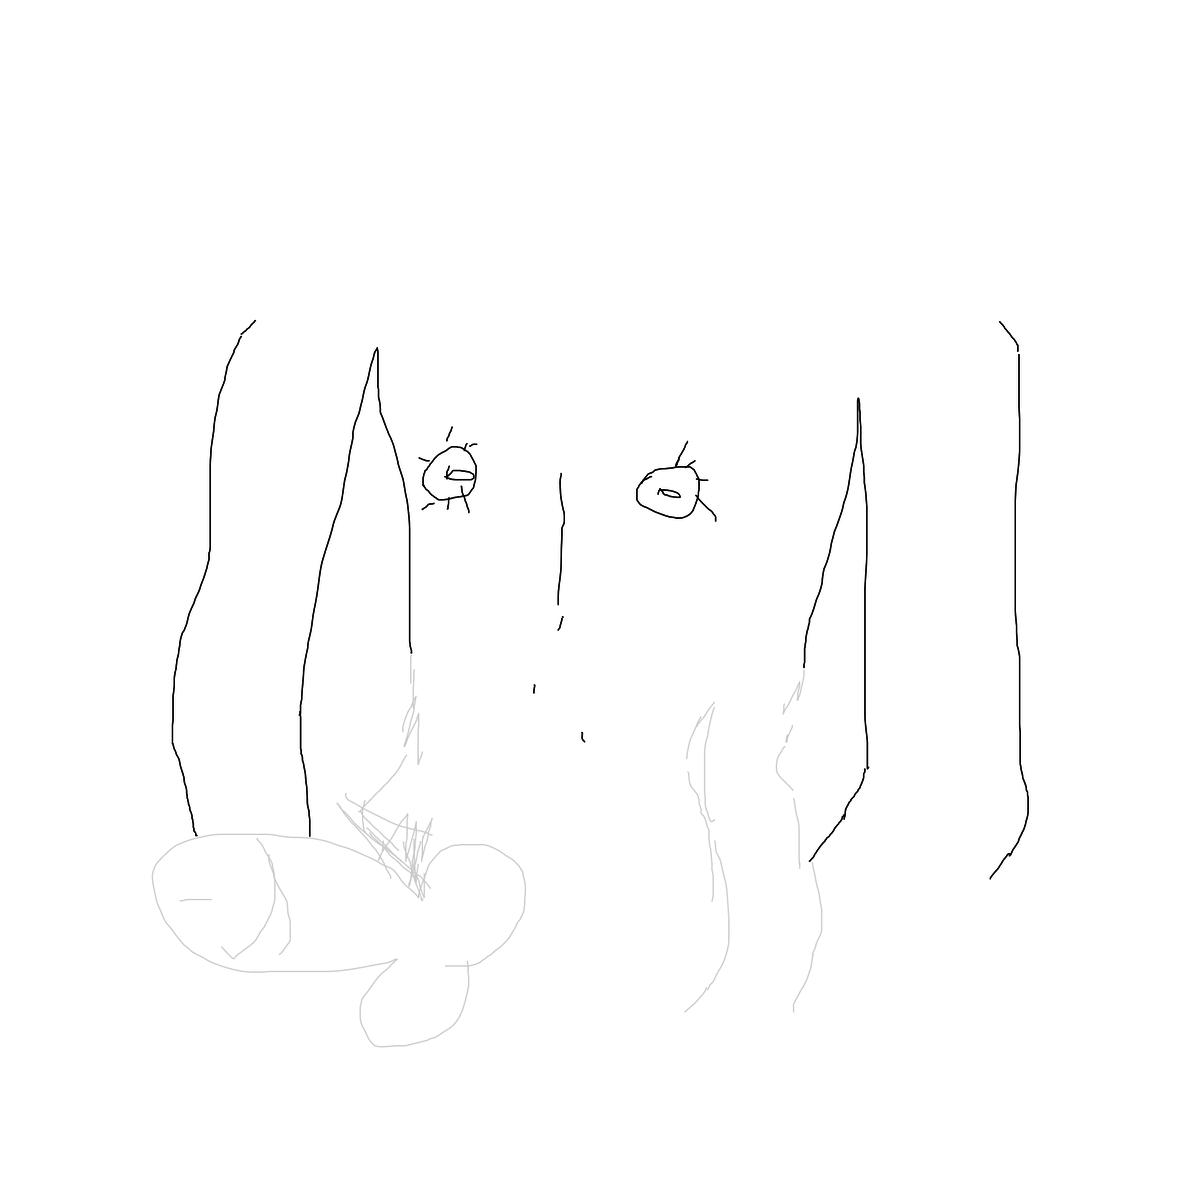 BAAAM drawing#9338 lat:63.4897804260253900lng: 26.3671970367431640